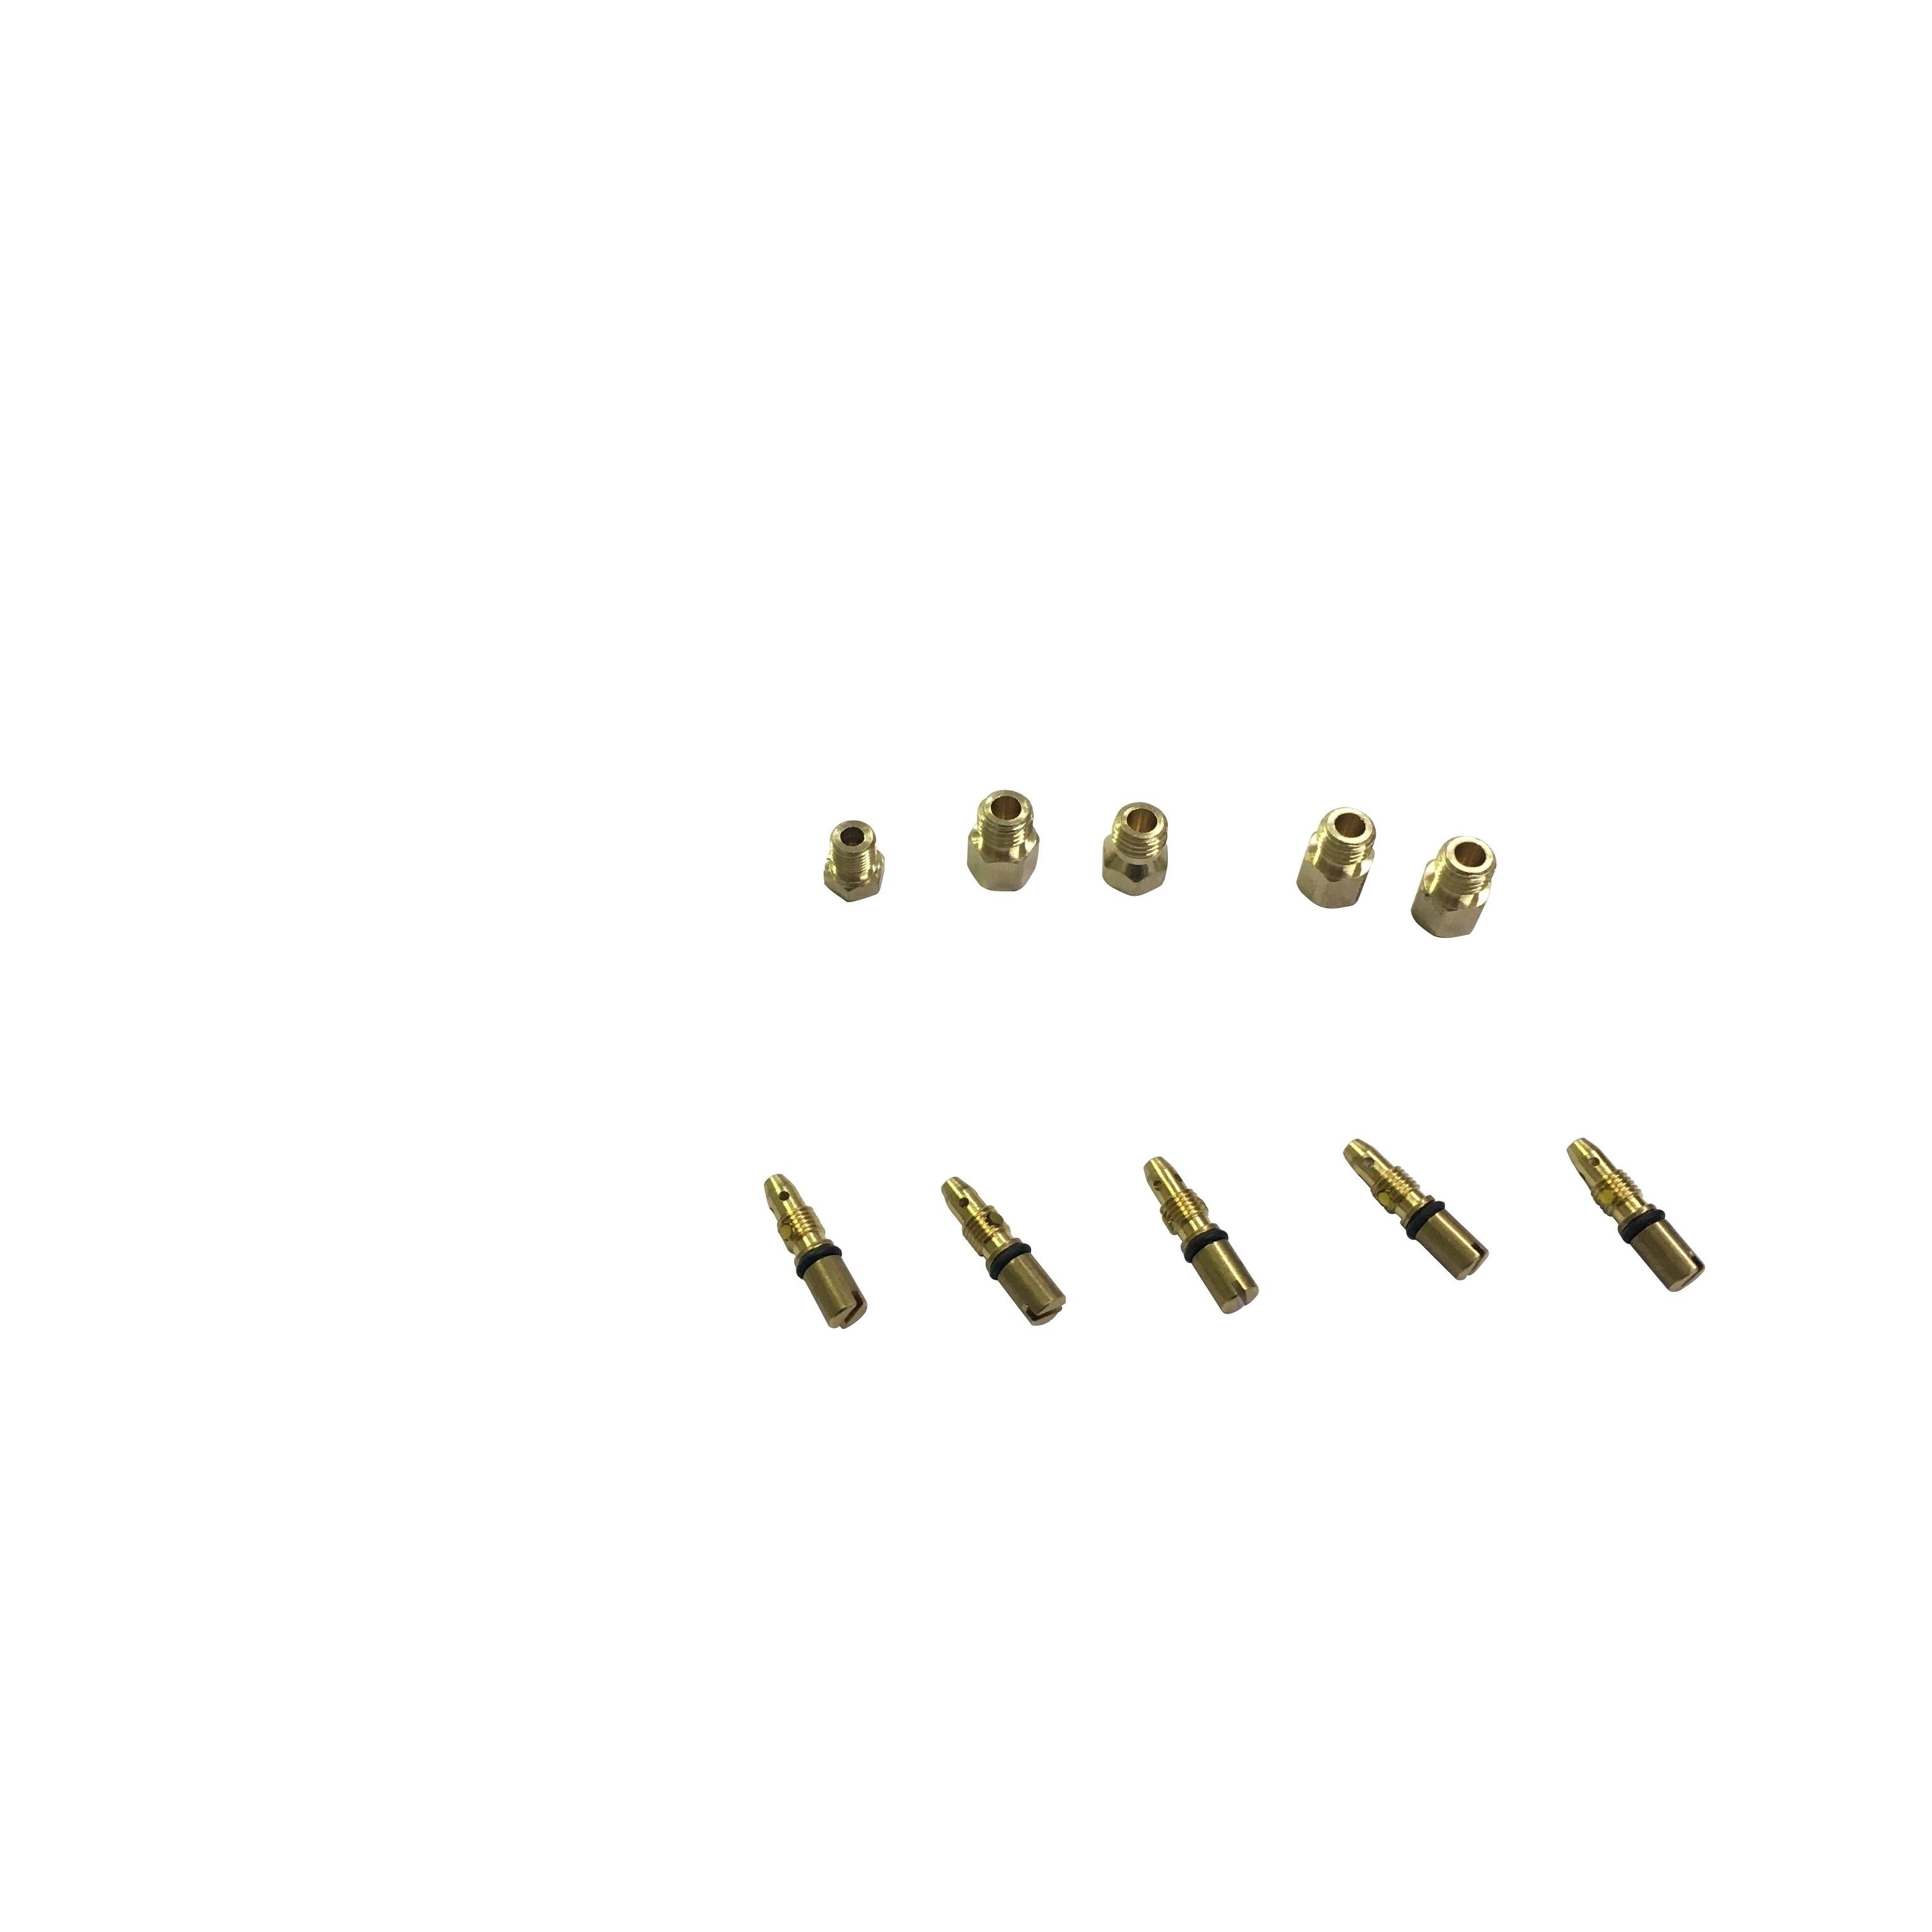 Liquid Propane Lp Conversion Kit For Thor Kitchen Lrg3001u Gas Range Overstock 28251874